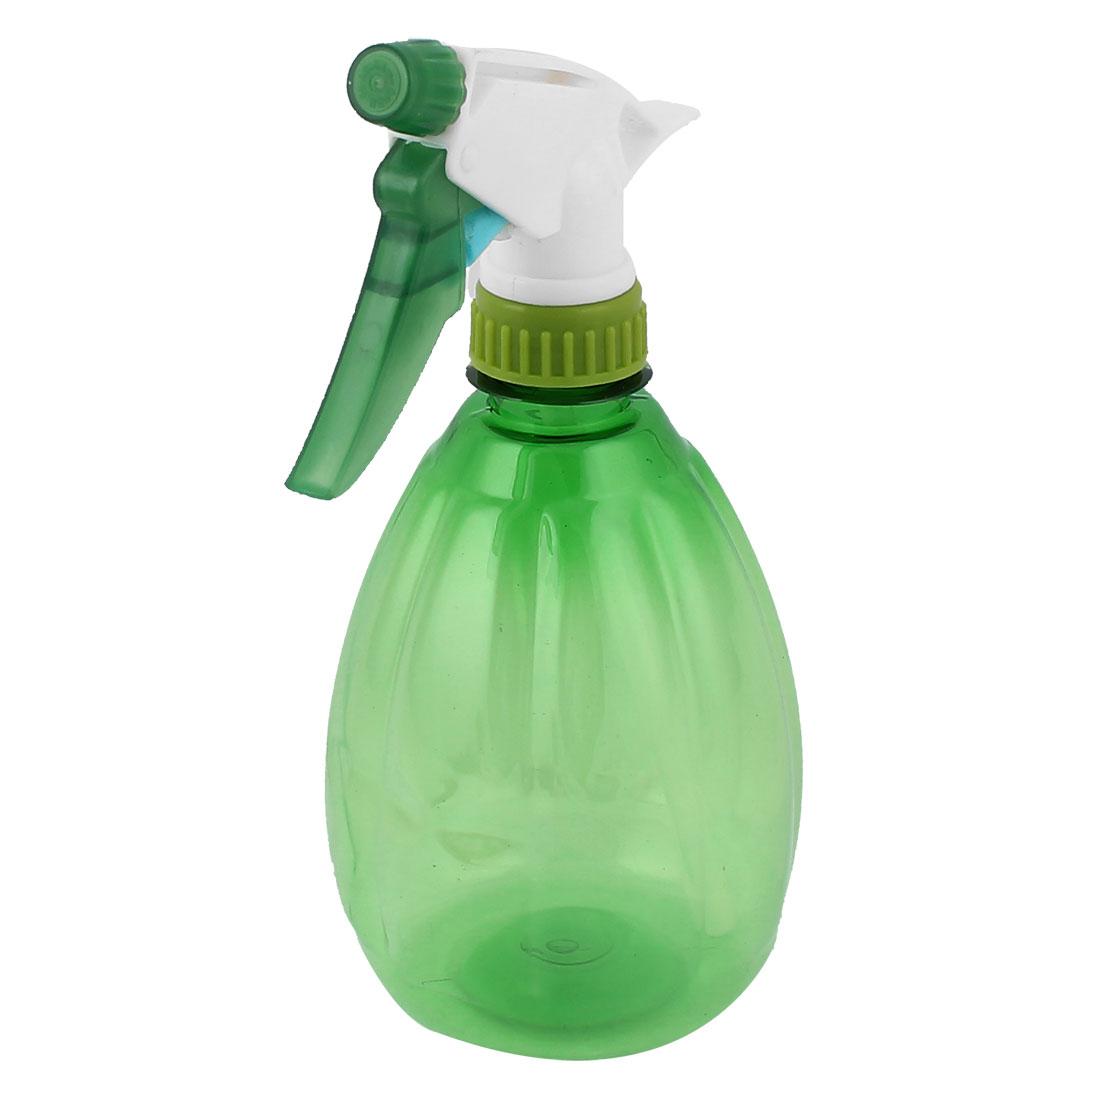 Hand Trigger Nozzle Head Water Sprayer Mist Spray Bottle Empty Container Green 500ml